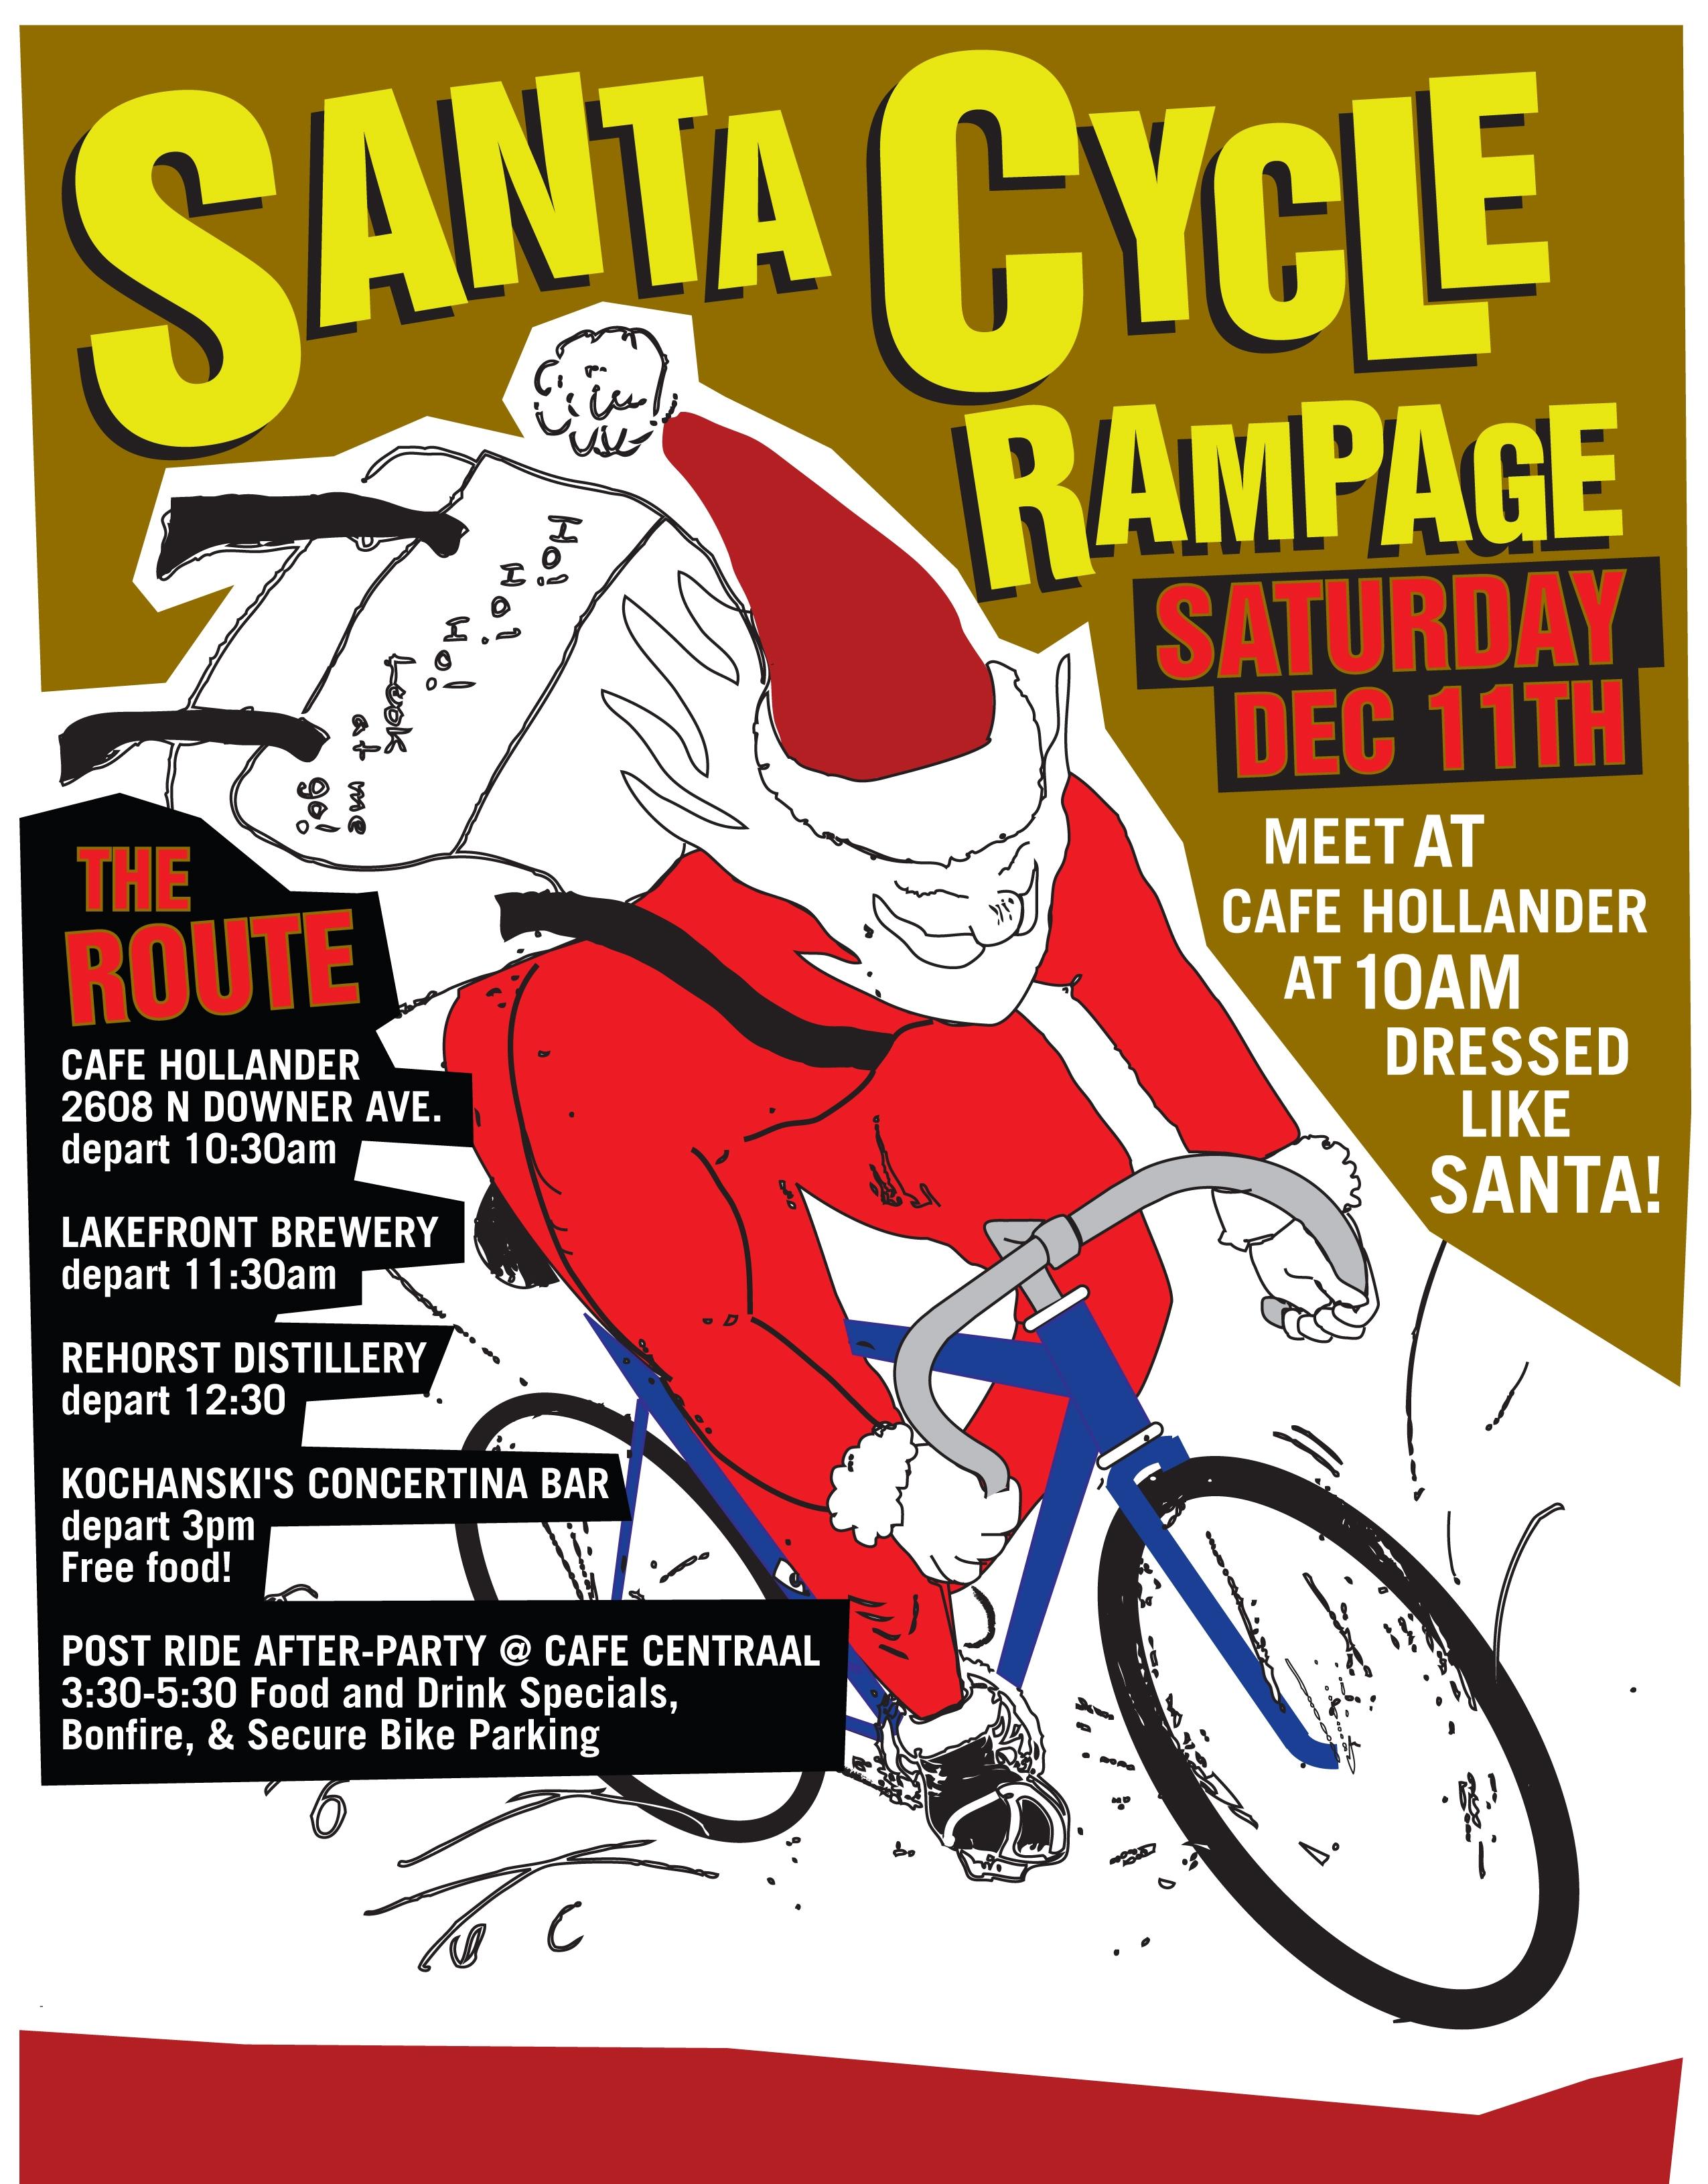 Santa Cycle Rampage Wisconsin Bike Fed